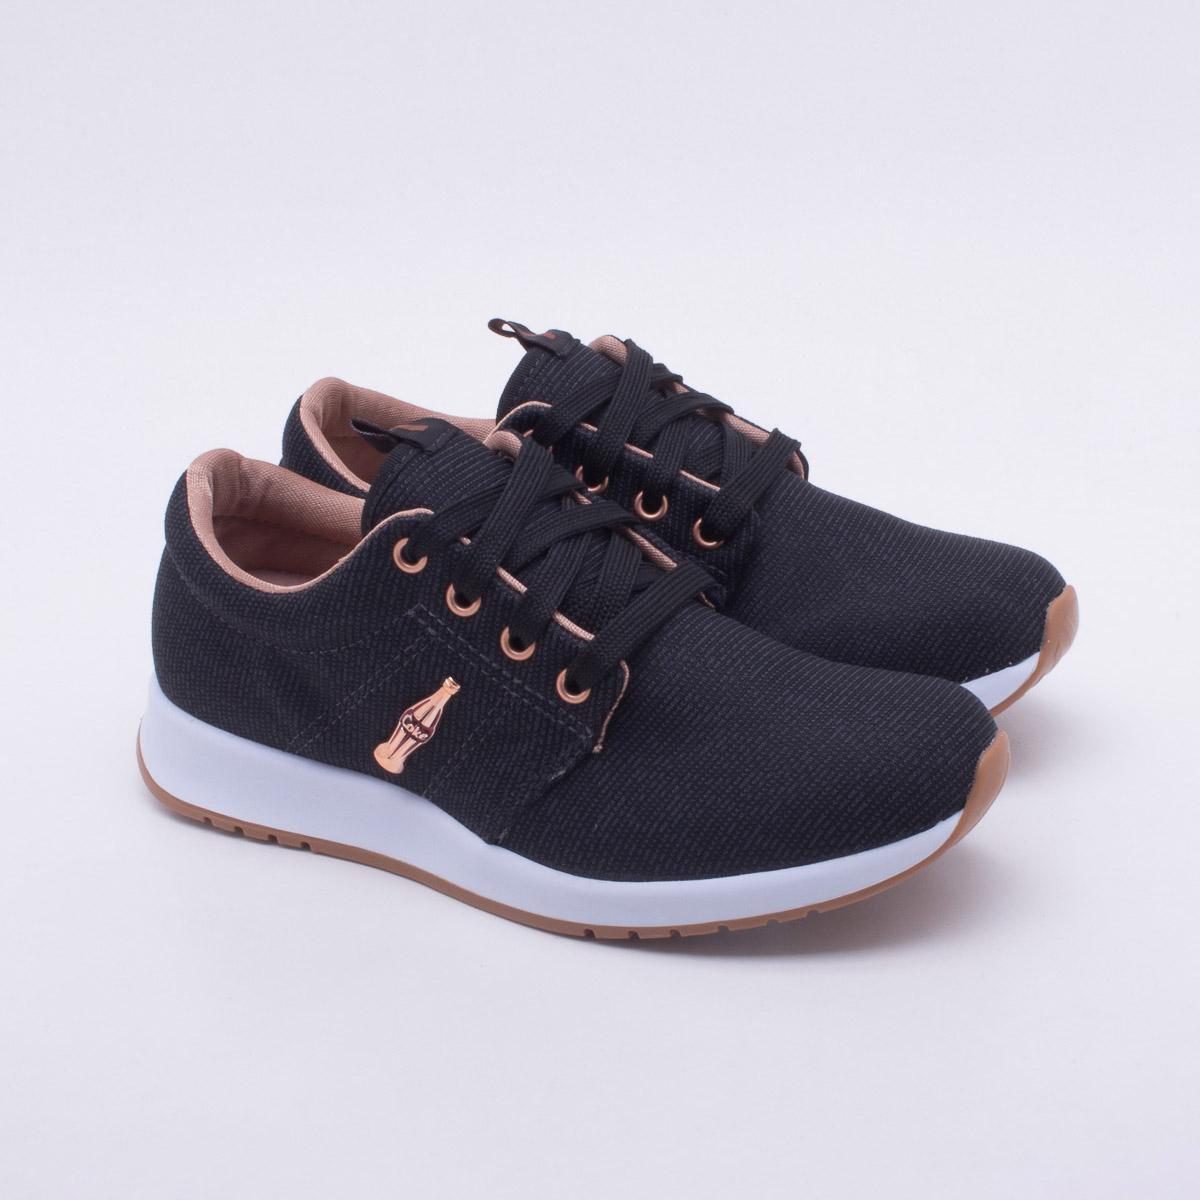 b515c4fbd Tênis Coca Cola Shoes Sense Zoon Feminino - Compre Agora